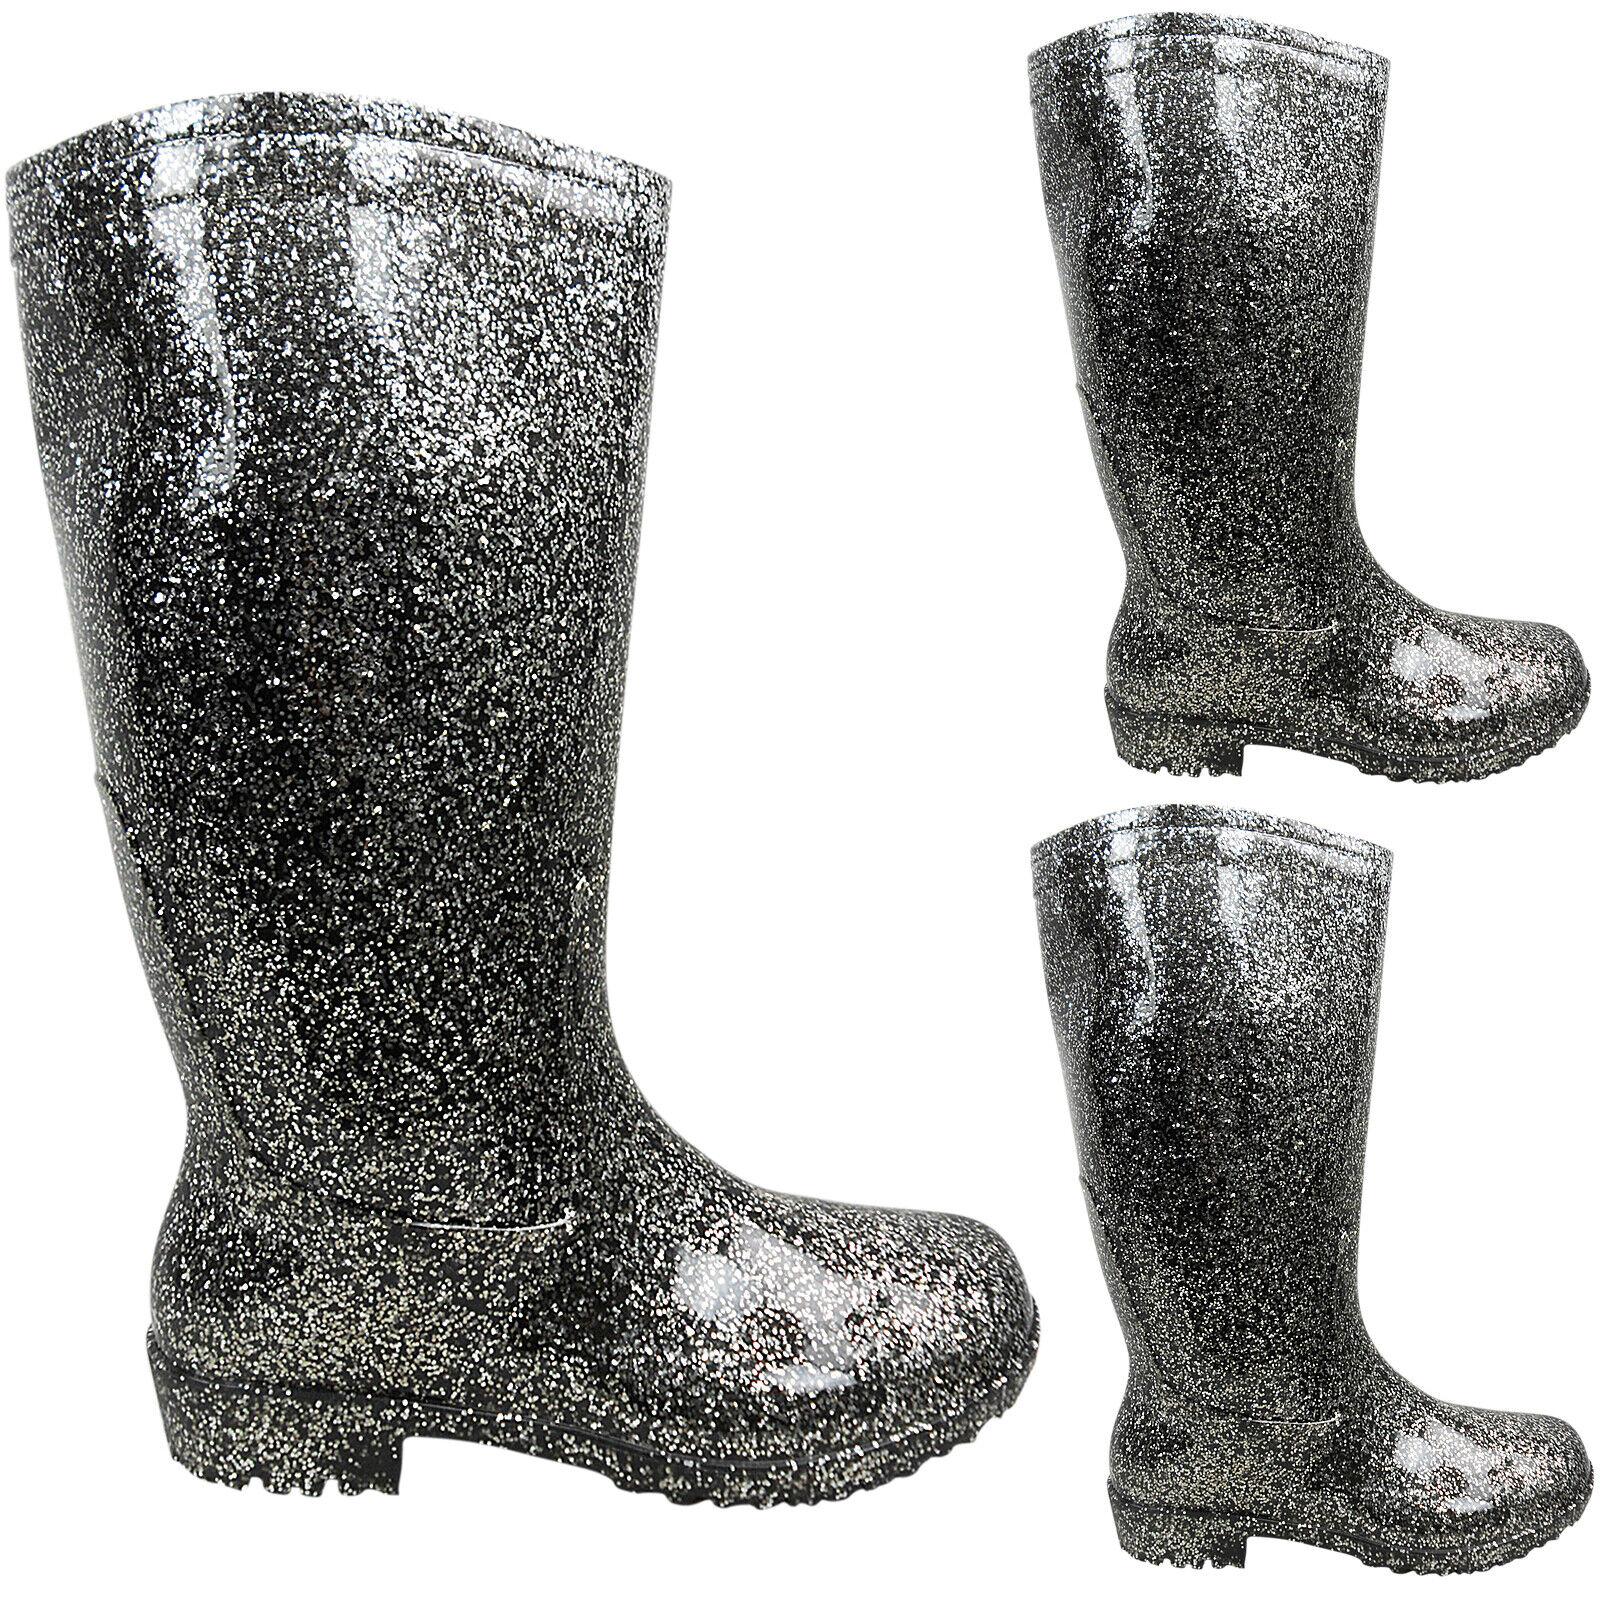 Ladies Womens Waterproof Wellies Wellington Rain Snow Knee Boots Shoes Size Muck